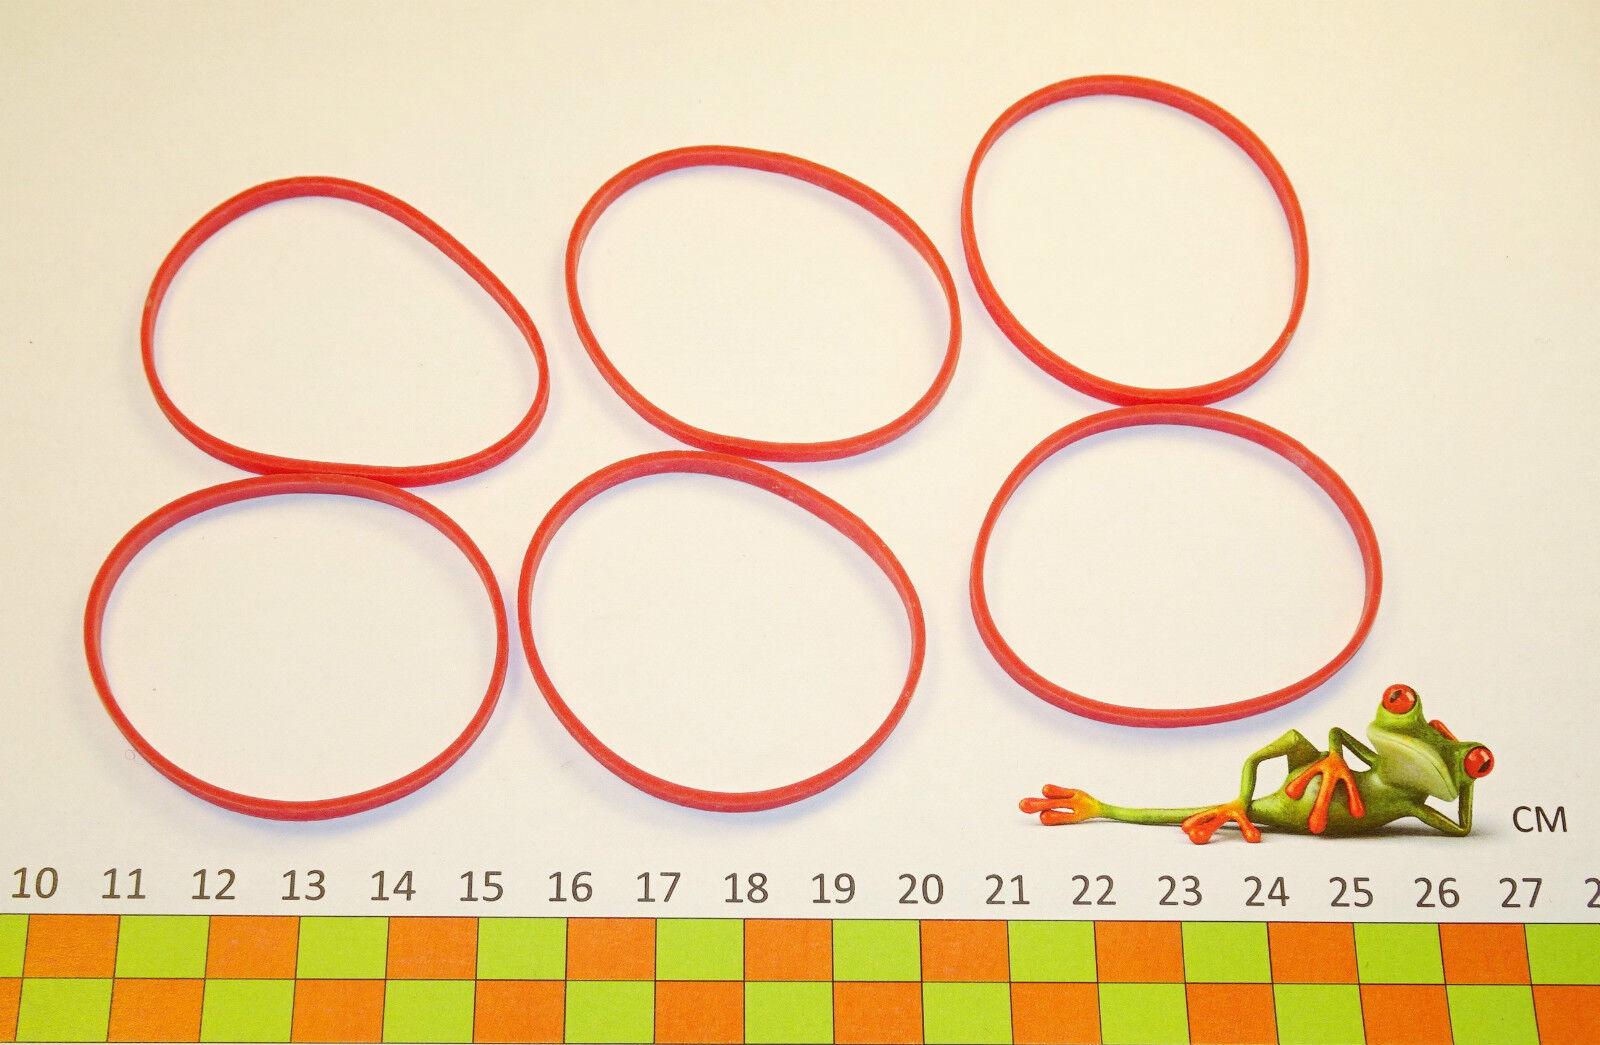 Elastiques Caoutchouc- 70(Ø45)mm x 3 mm- sac de 1kg 1kg de 5ecbbd